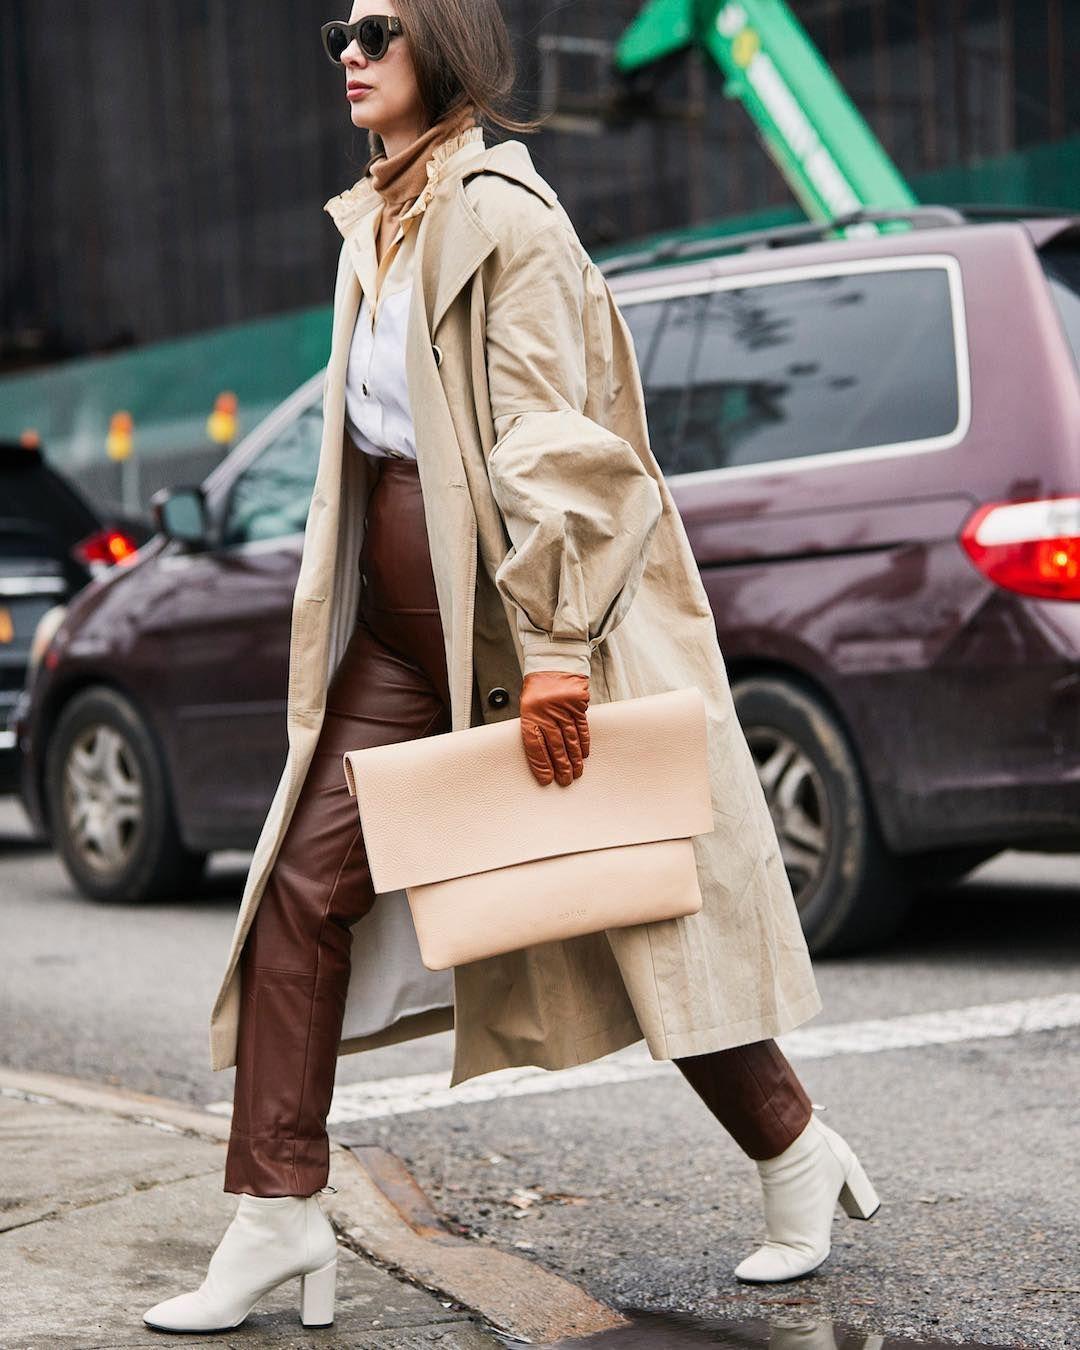 Harper S Bazaar Polska On Instagram Nowojorski Tydzien Mody Na Sezon Jesien Zima 2019 20 Dobie Cool Street Fashion New York Fashion Week Color Trends Fashion